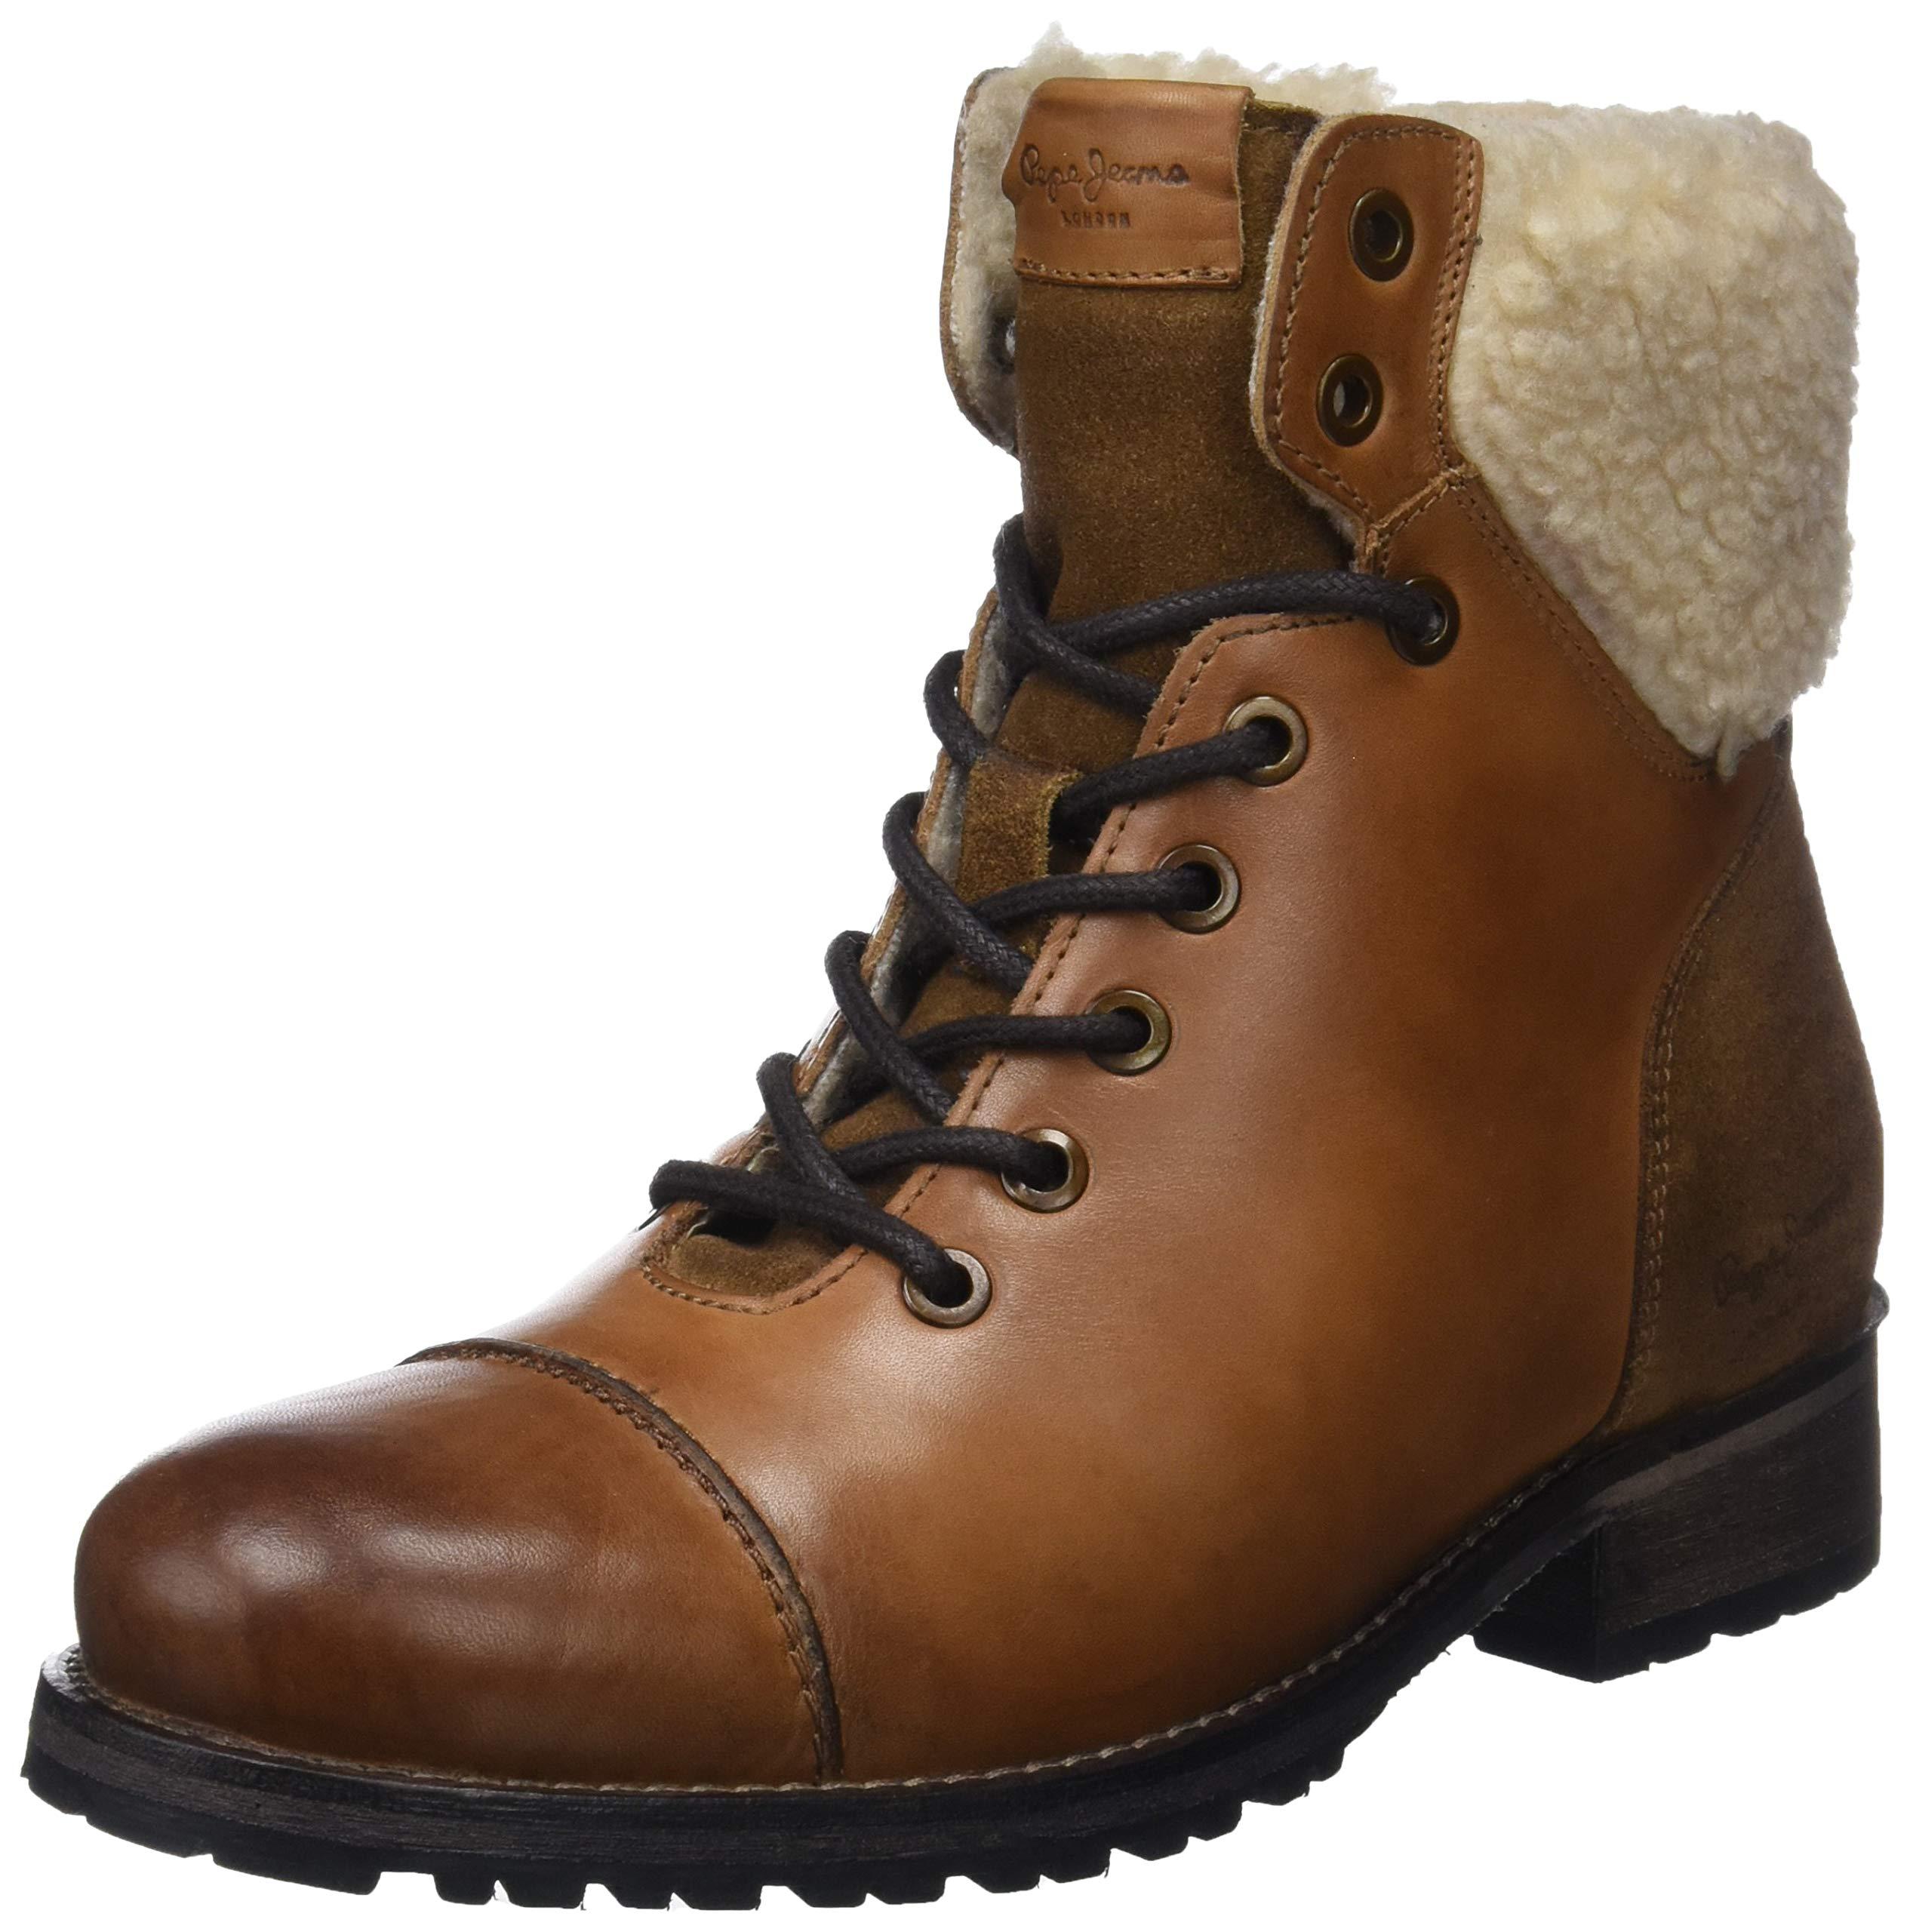 Jeans London Eu Brown WarmBotines Melting 87739 FemmeMarronnut Pepe USzMGqpV